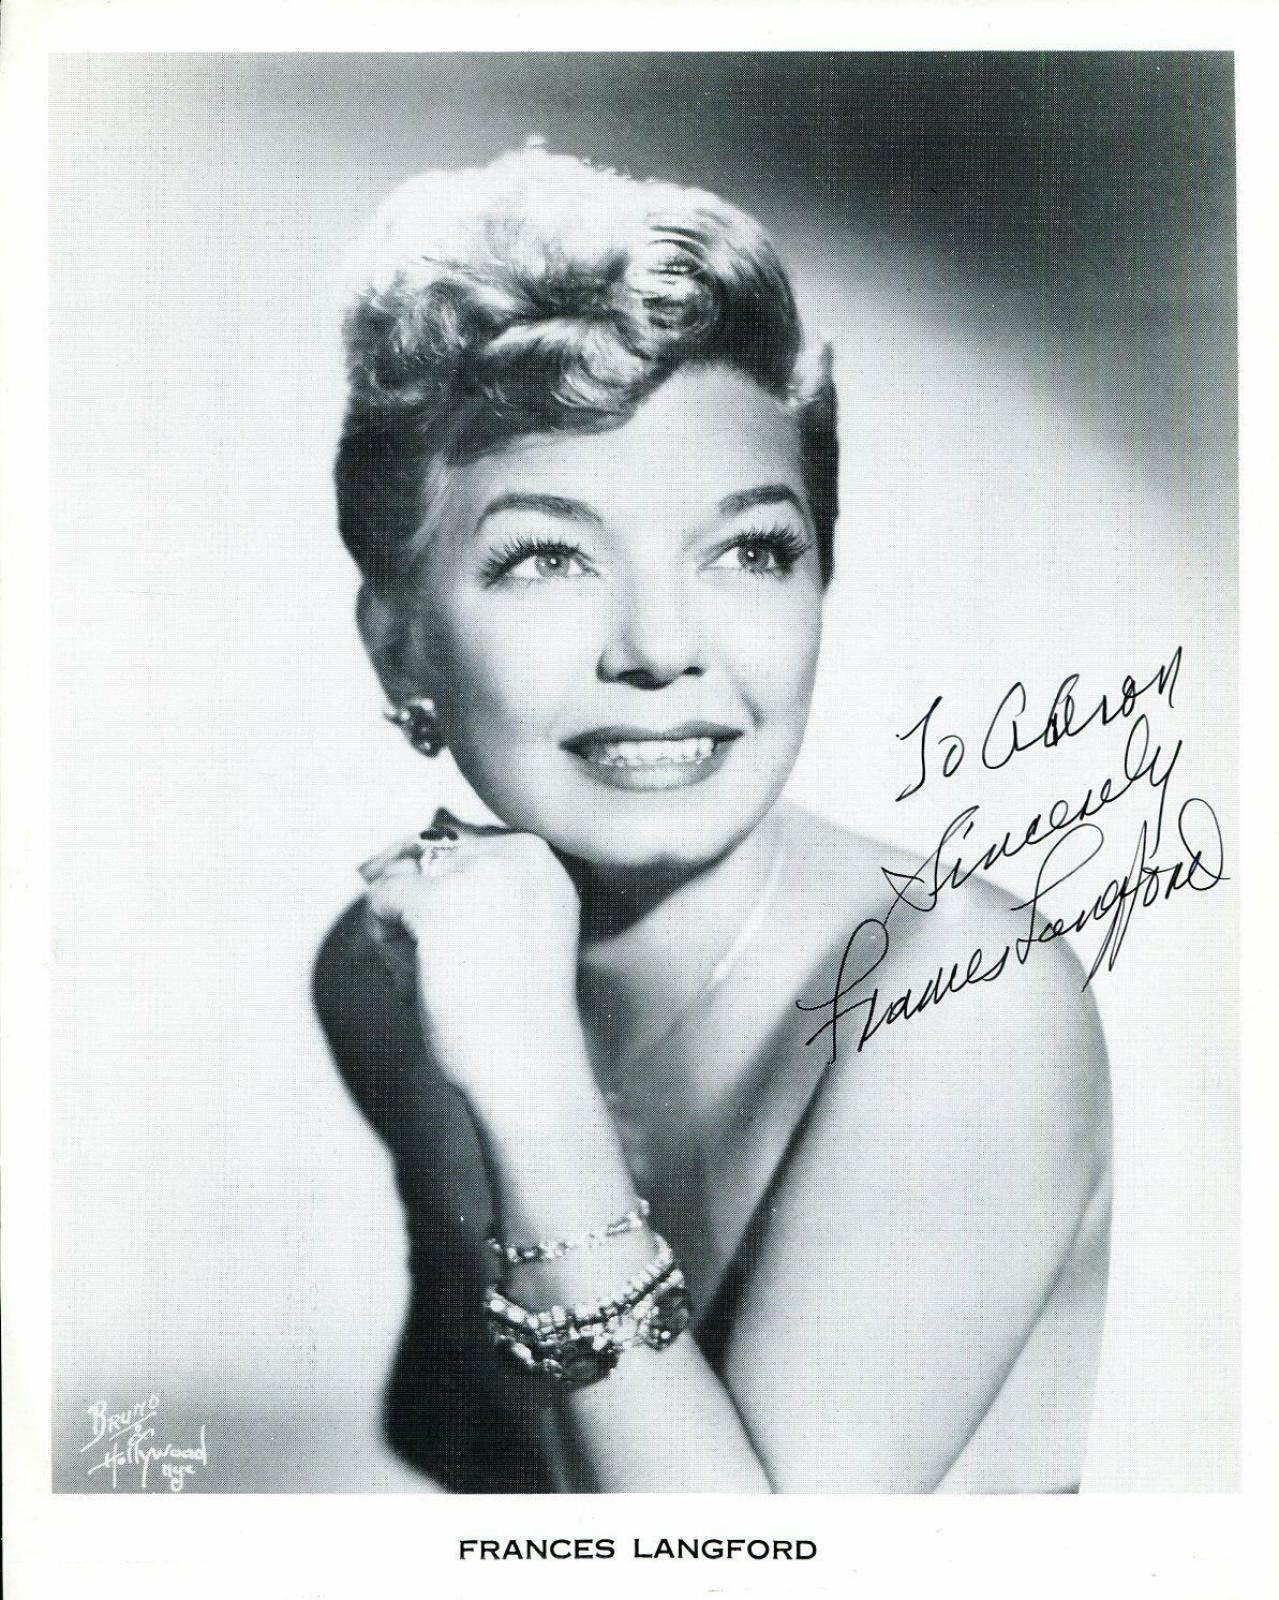 Frances Langford Jazz Big Band Signer Actress Signed Autograph Photo